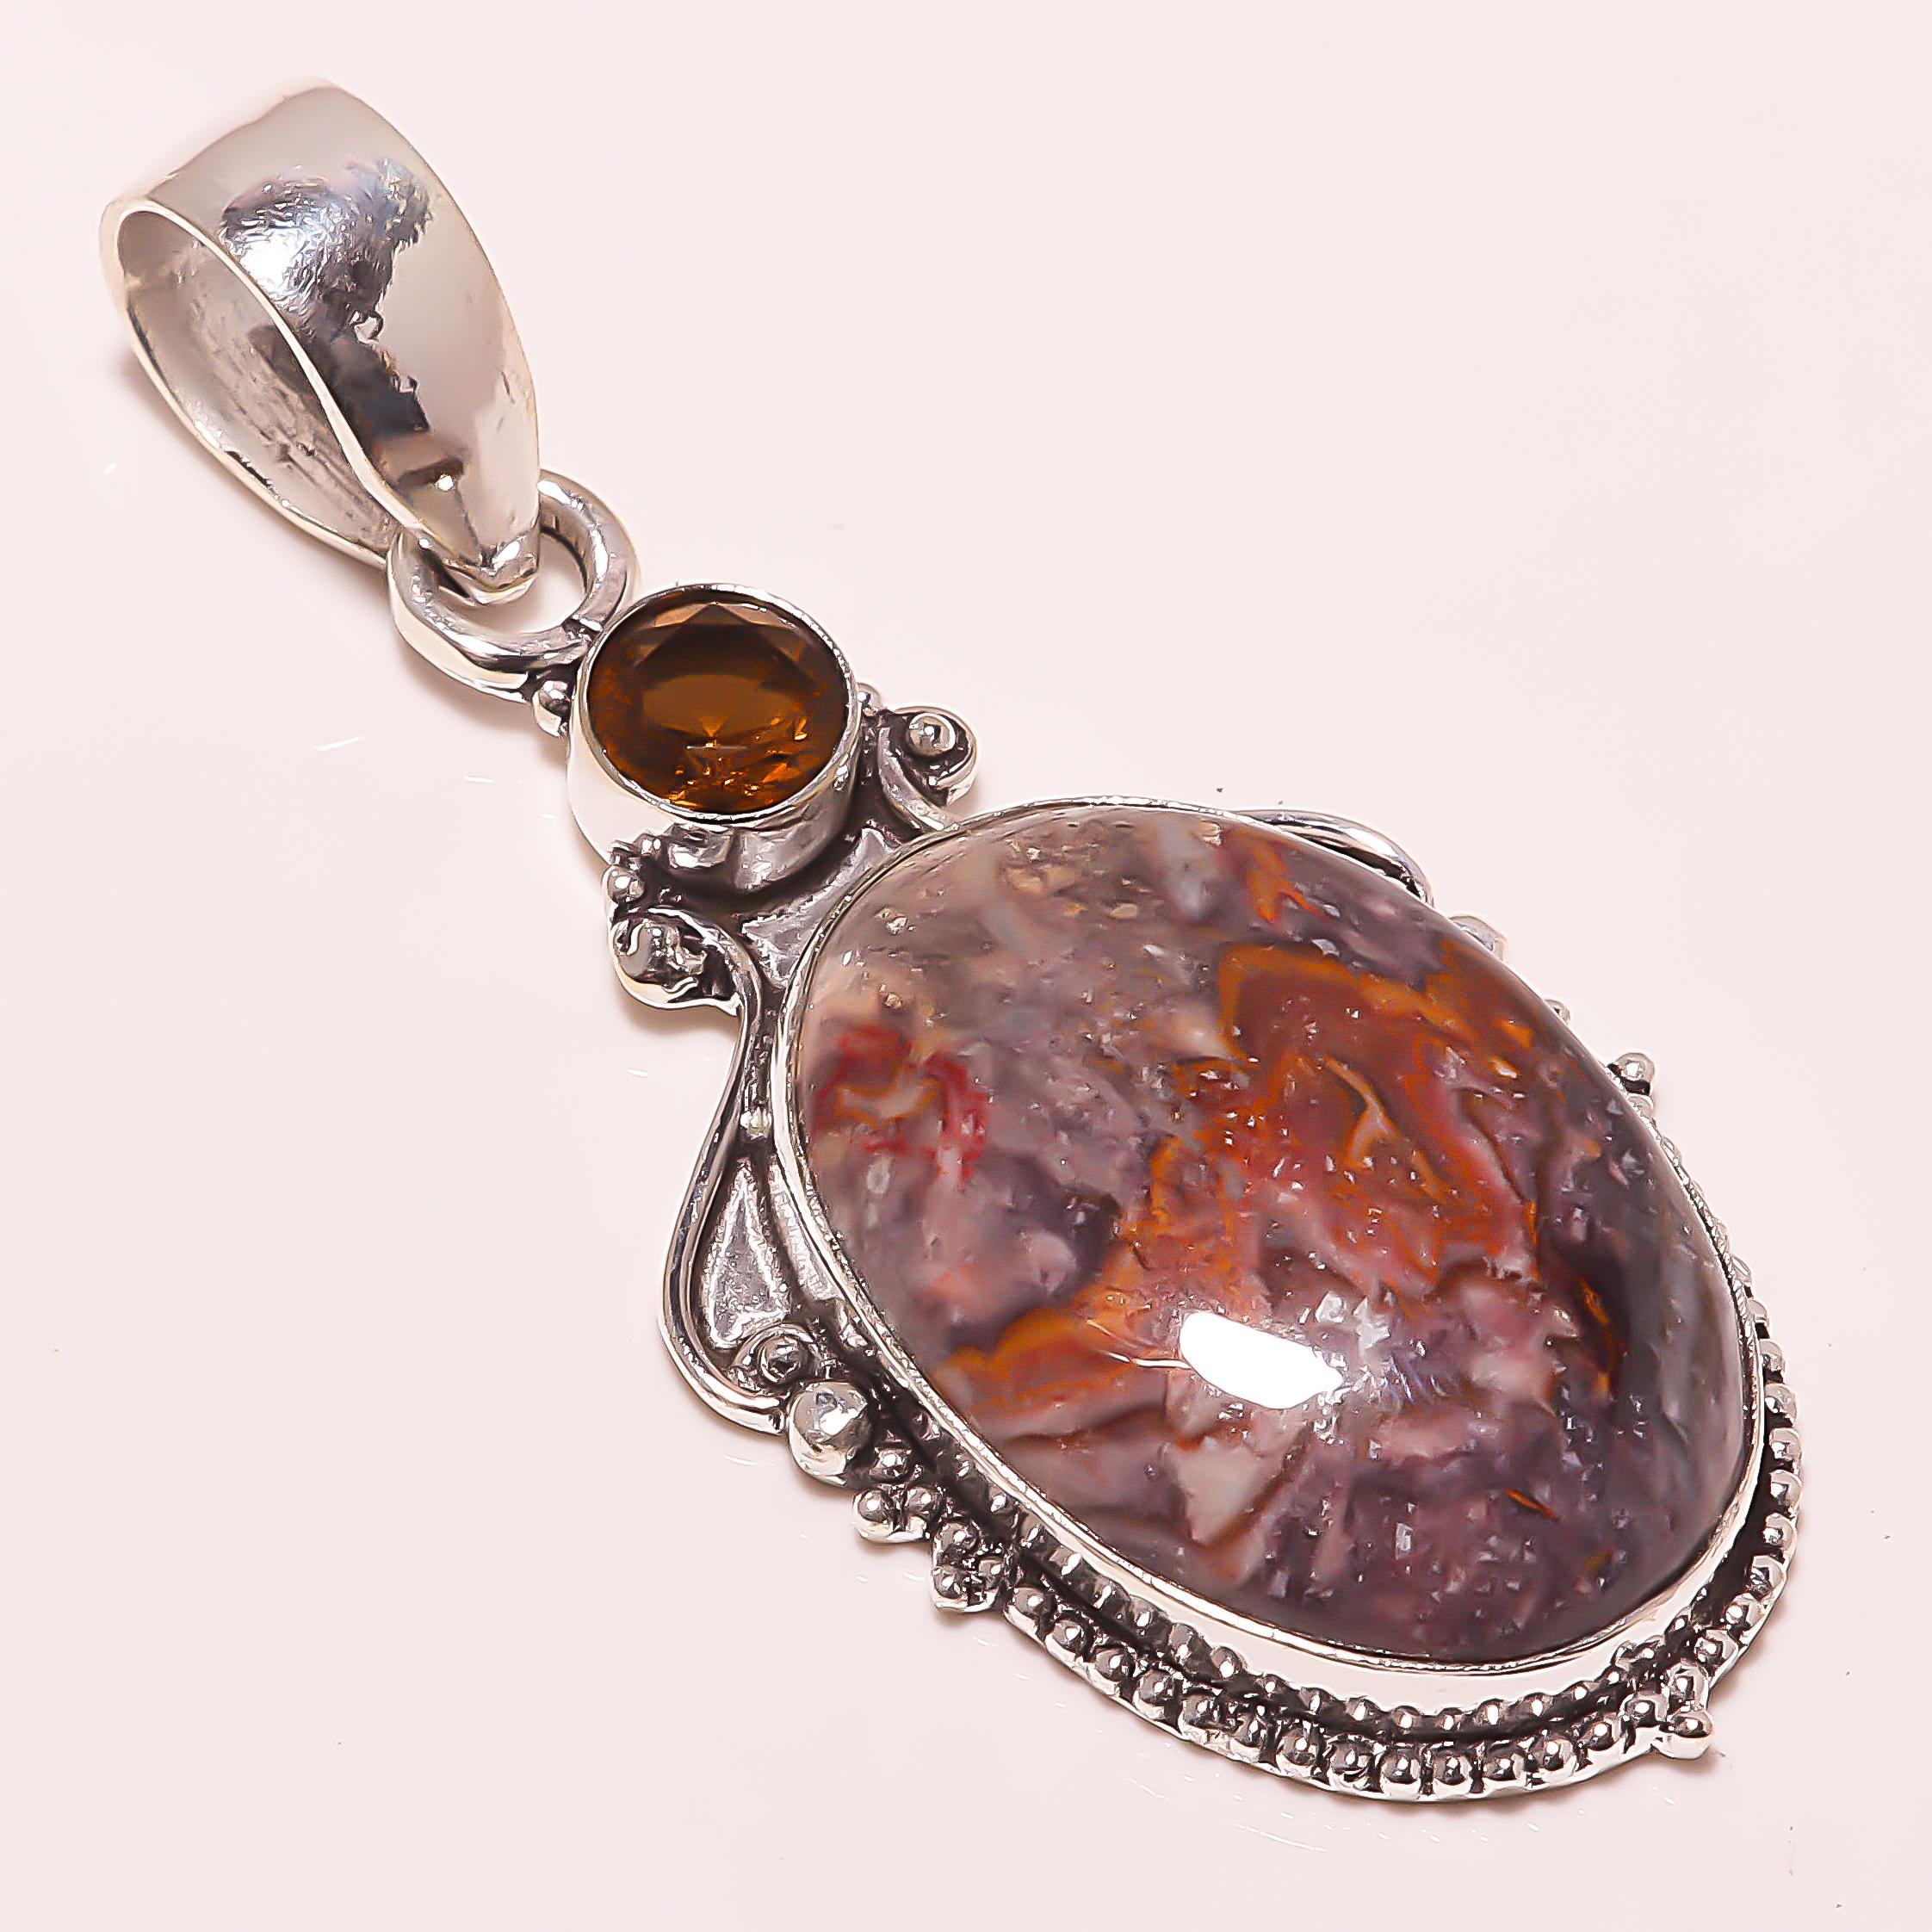 2e5b7a333 Lipedolite gem stone gemstone 925 silver jewelry pendant 2.64